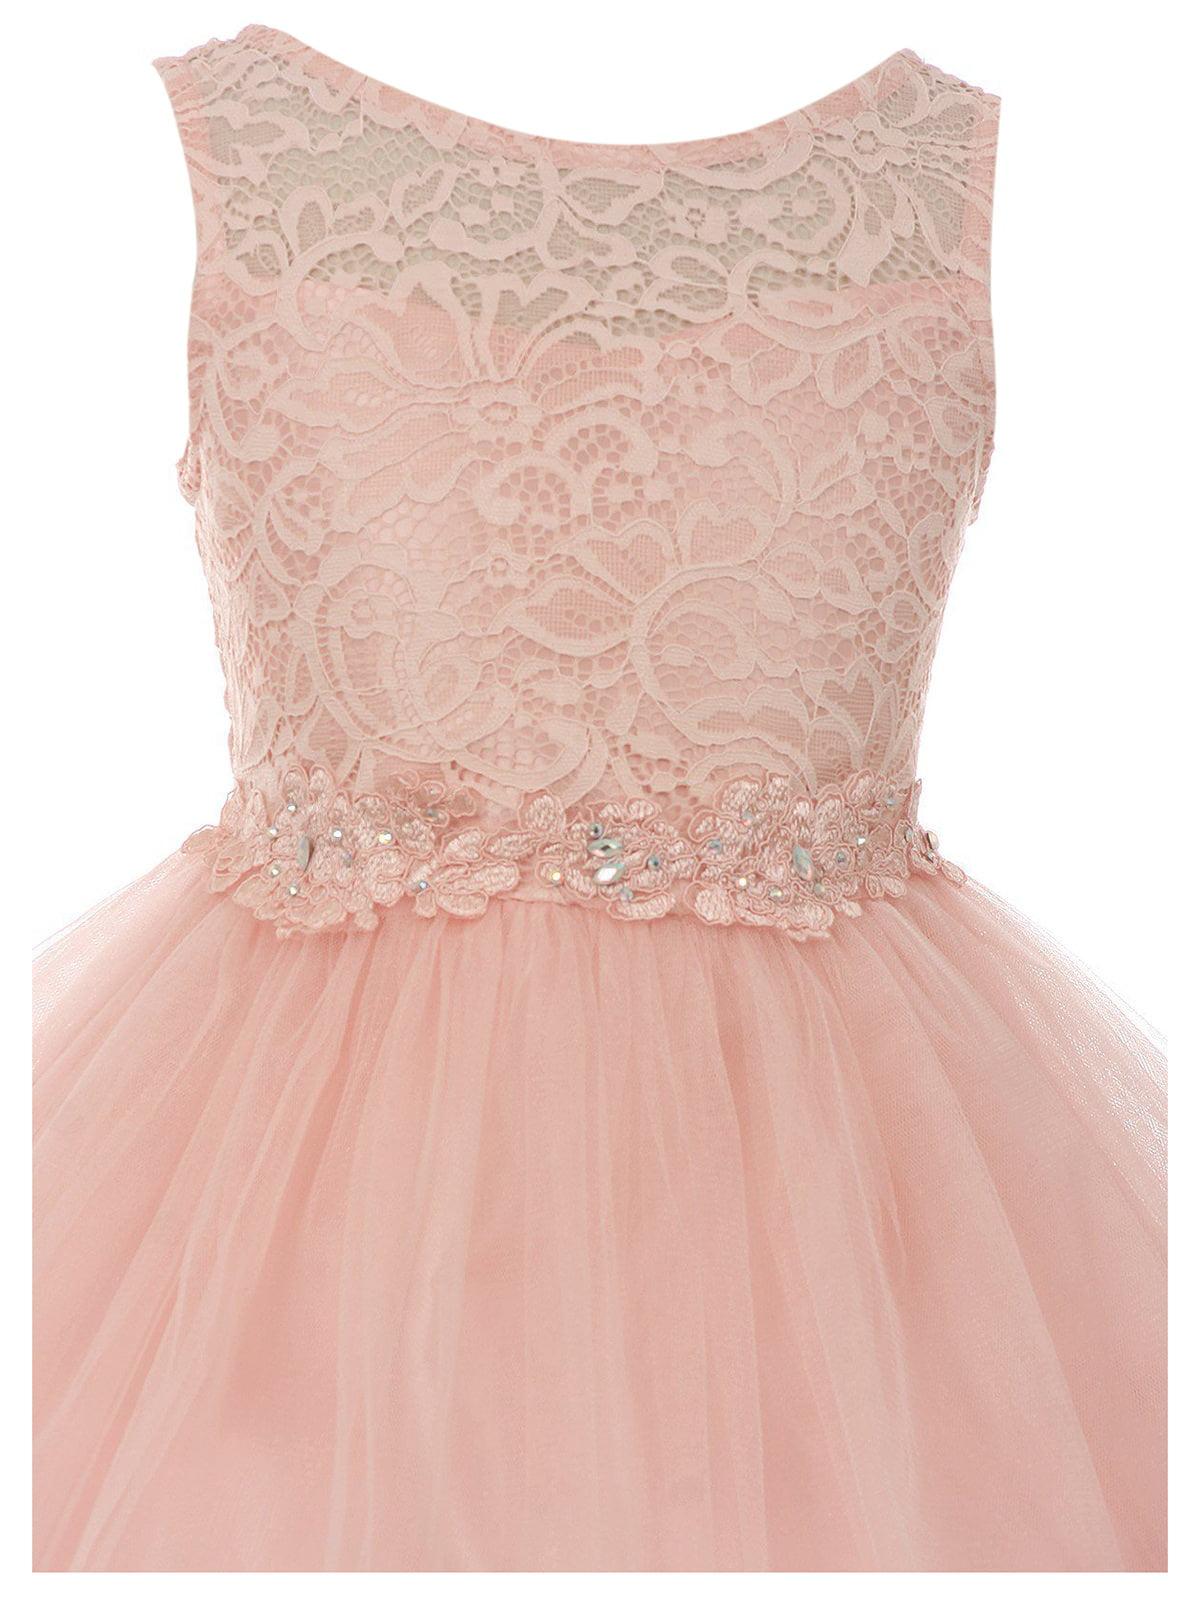 1e251c283 Dreamer P - Big Girls' Dress Lace Tulle Pageant Holiday Christmas Party Flower  Girl Dress Blush Size 18 (M10BK49) - Walmart.com